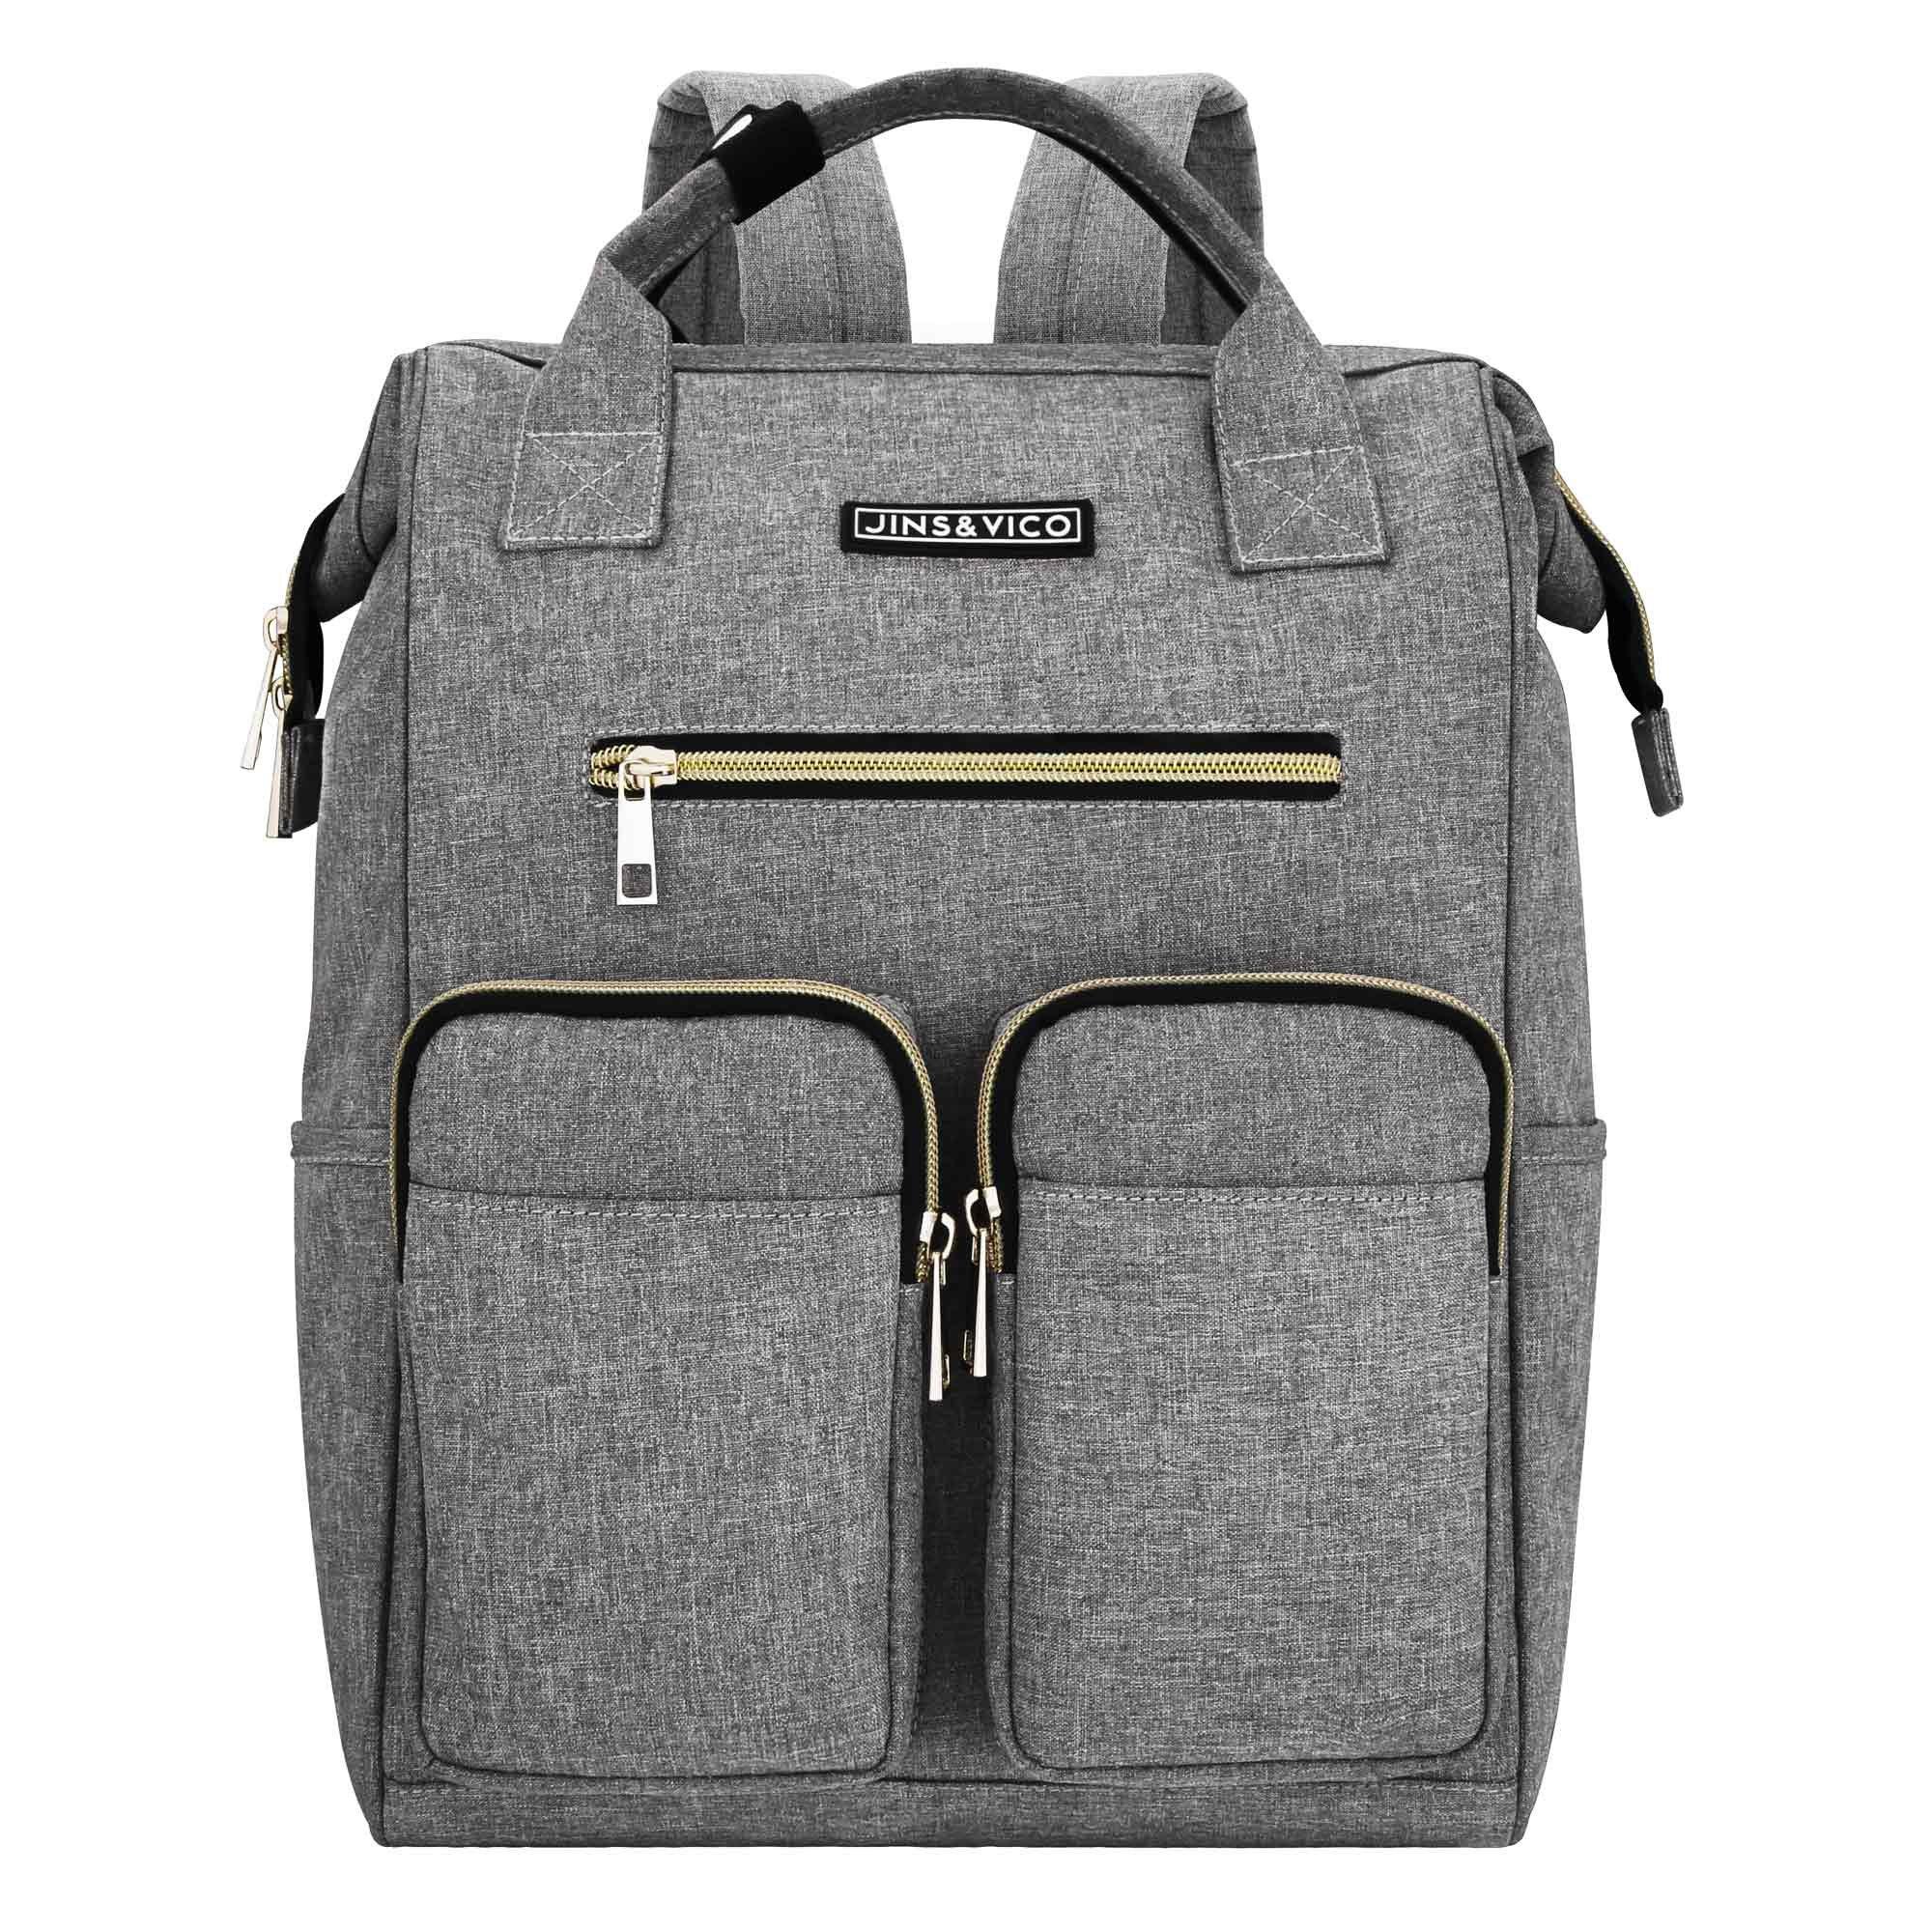 JINS & VICO Laptop Backpacks, Wide Open Professional Business Laptop Bag Large Bookbag Handbag Casual Daypacks for School/College/Business, Grey